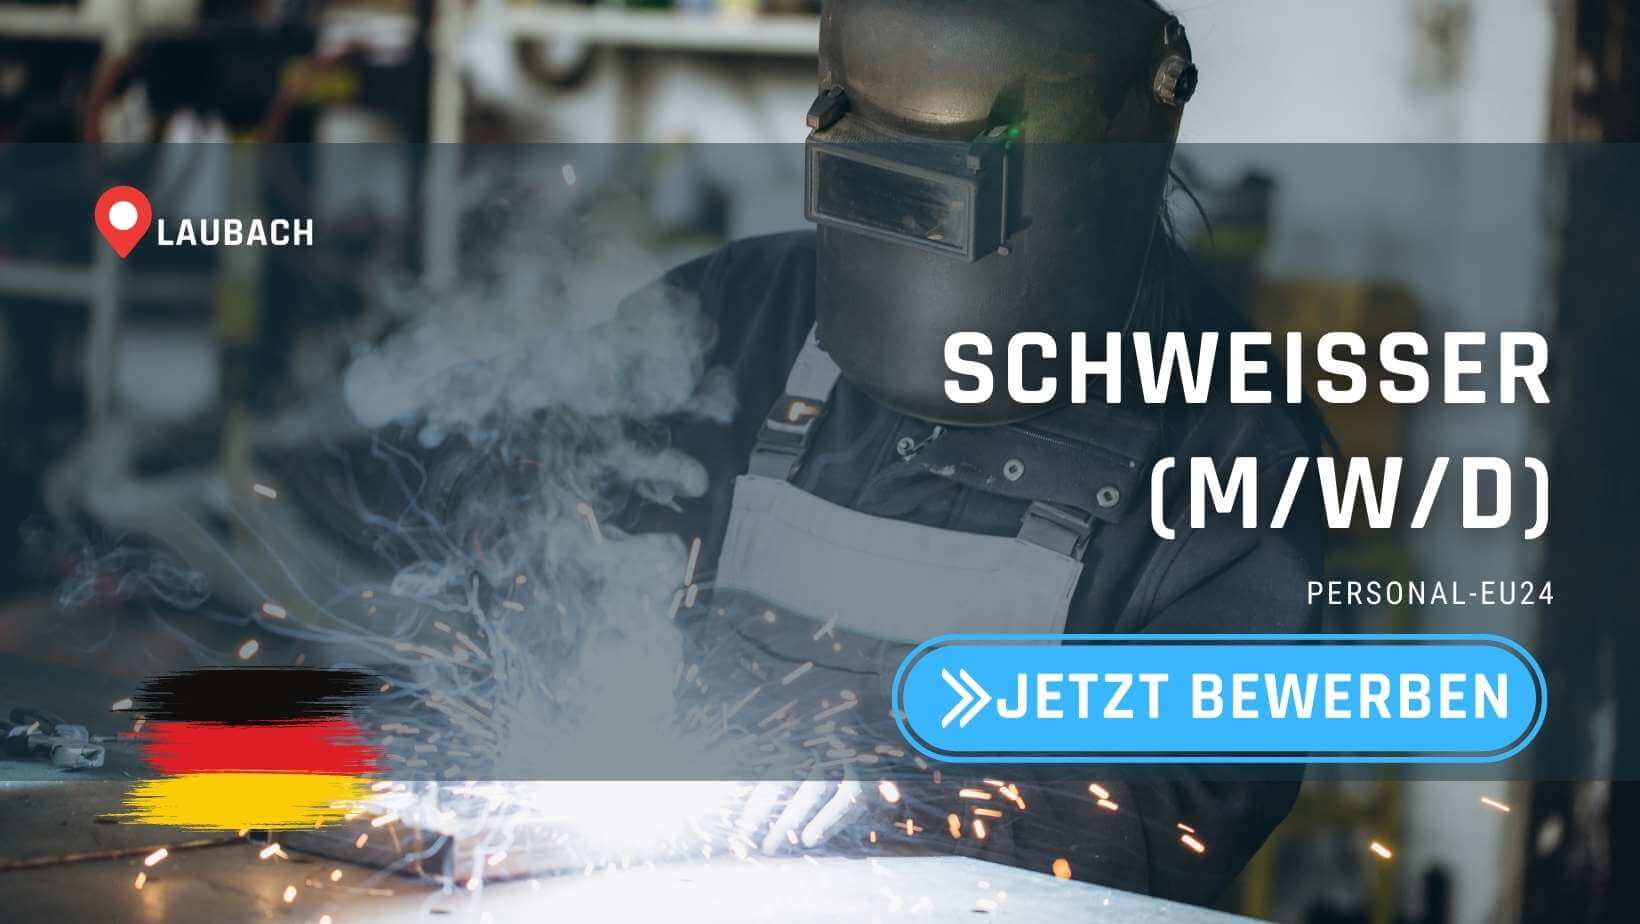 DE_K0013_119 Schweißer - Jobs in Laubach_